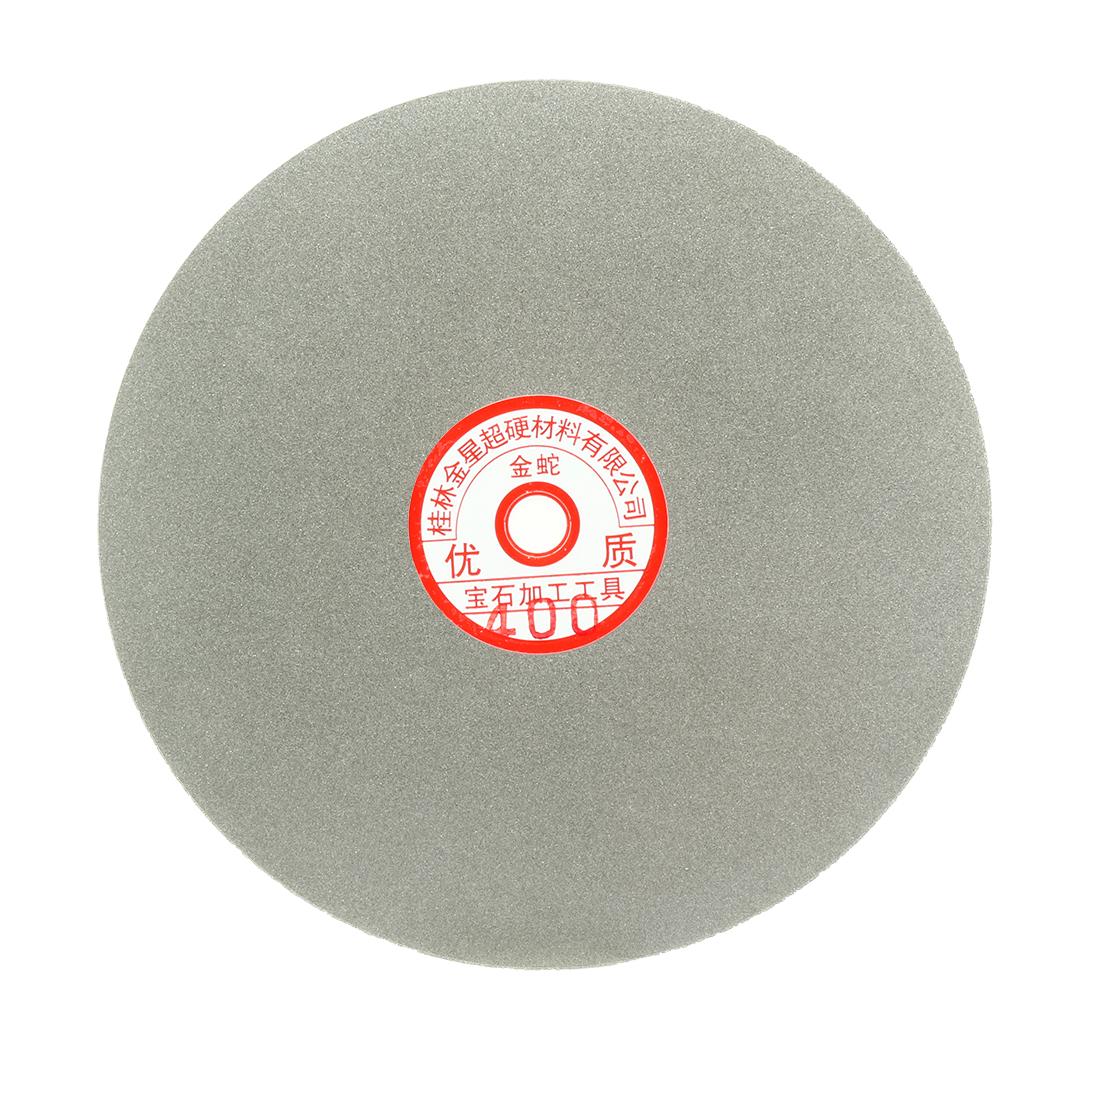 200mm 8-inch Grit 400 Diamond Coated Flat Lap Disk Wheel Grinding Sanding Disc